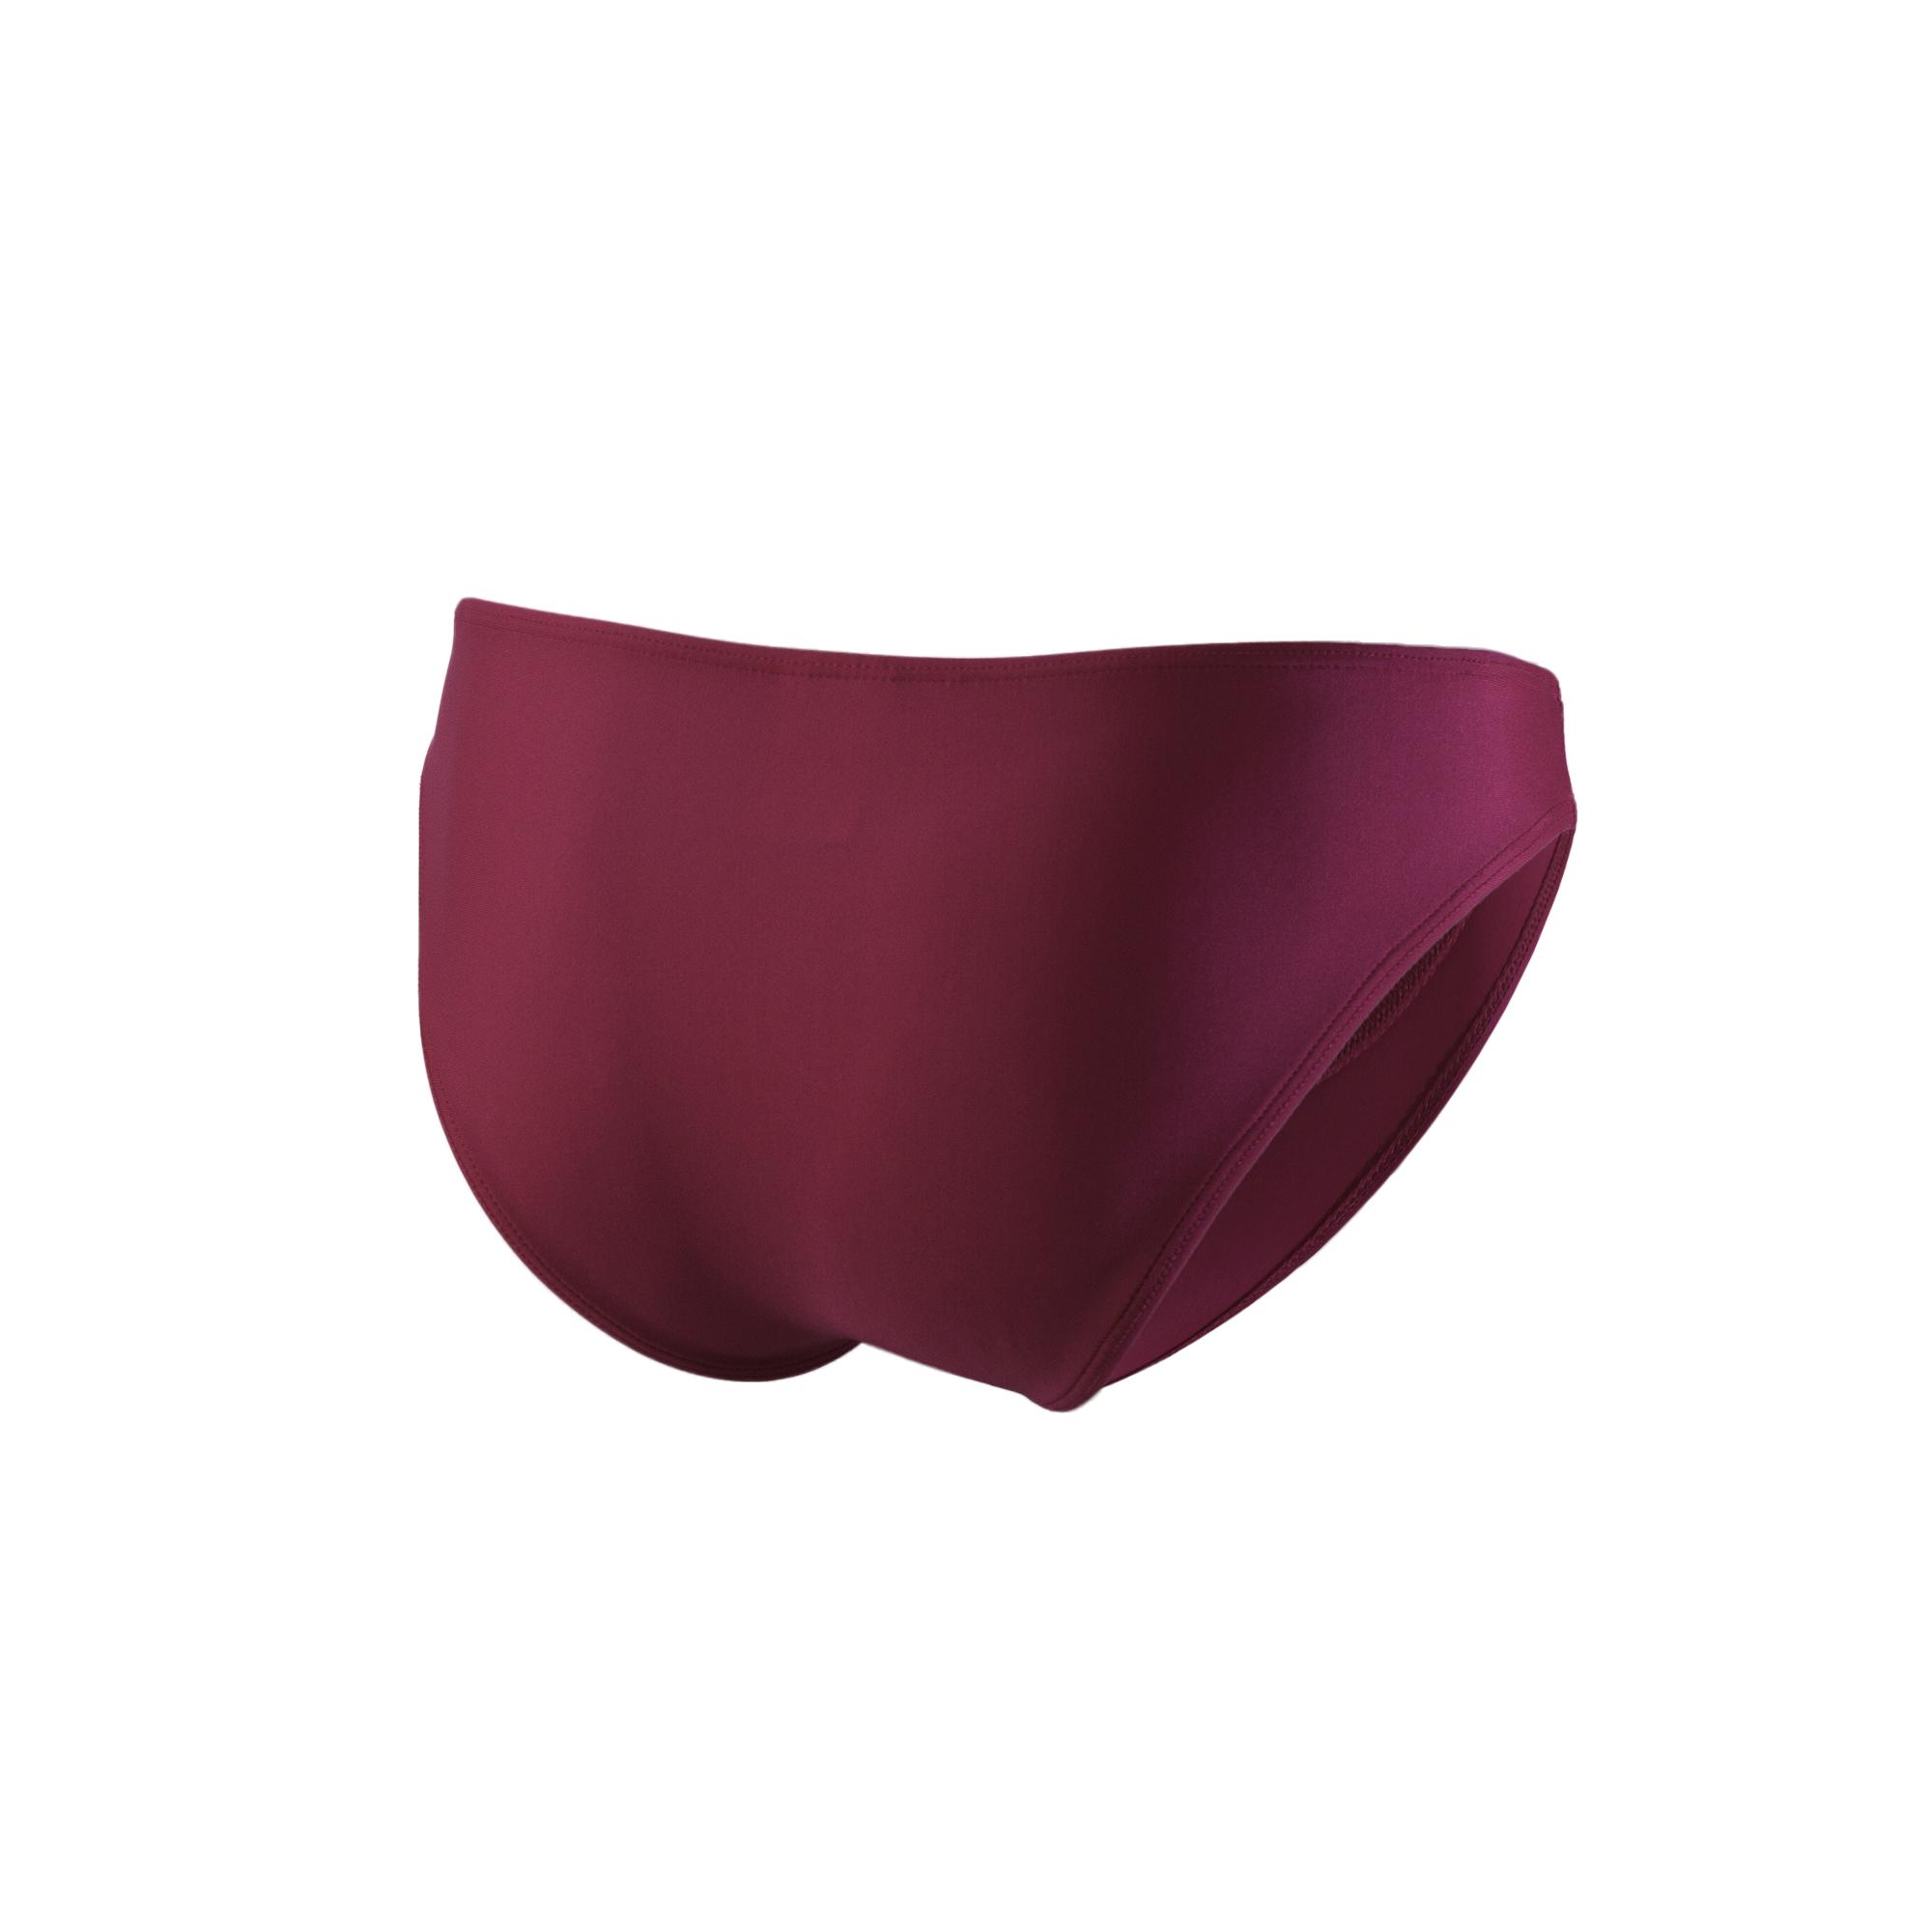 Fuchsia Polyester Classic Men's Bikini